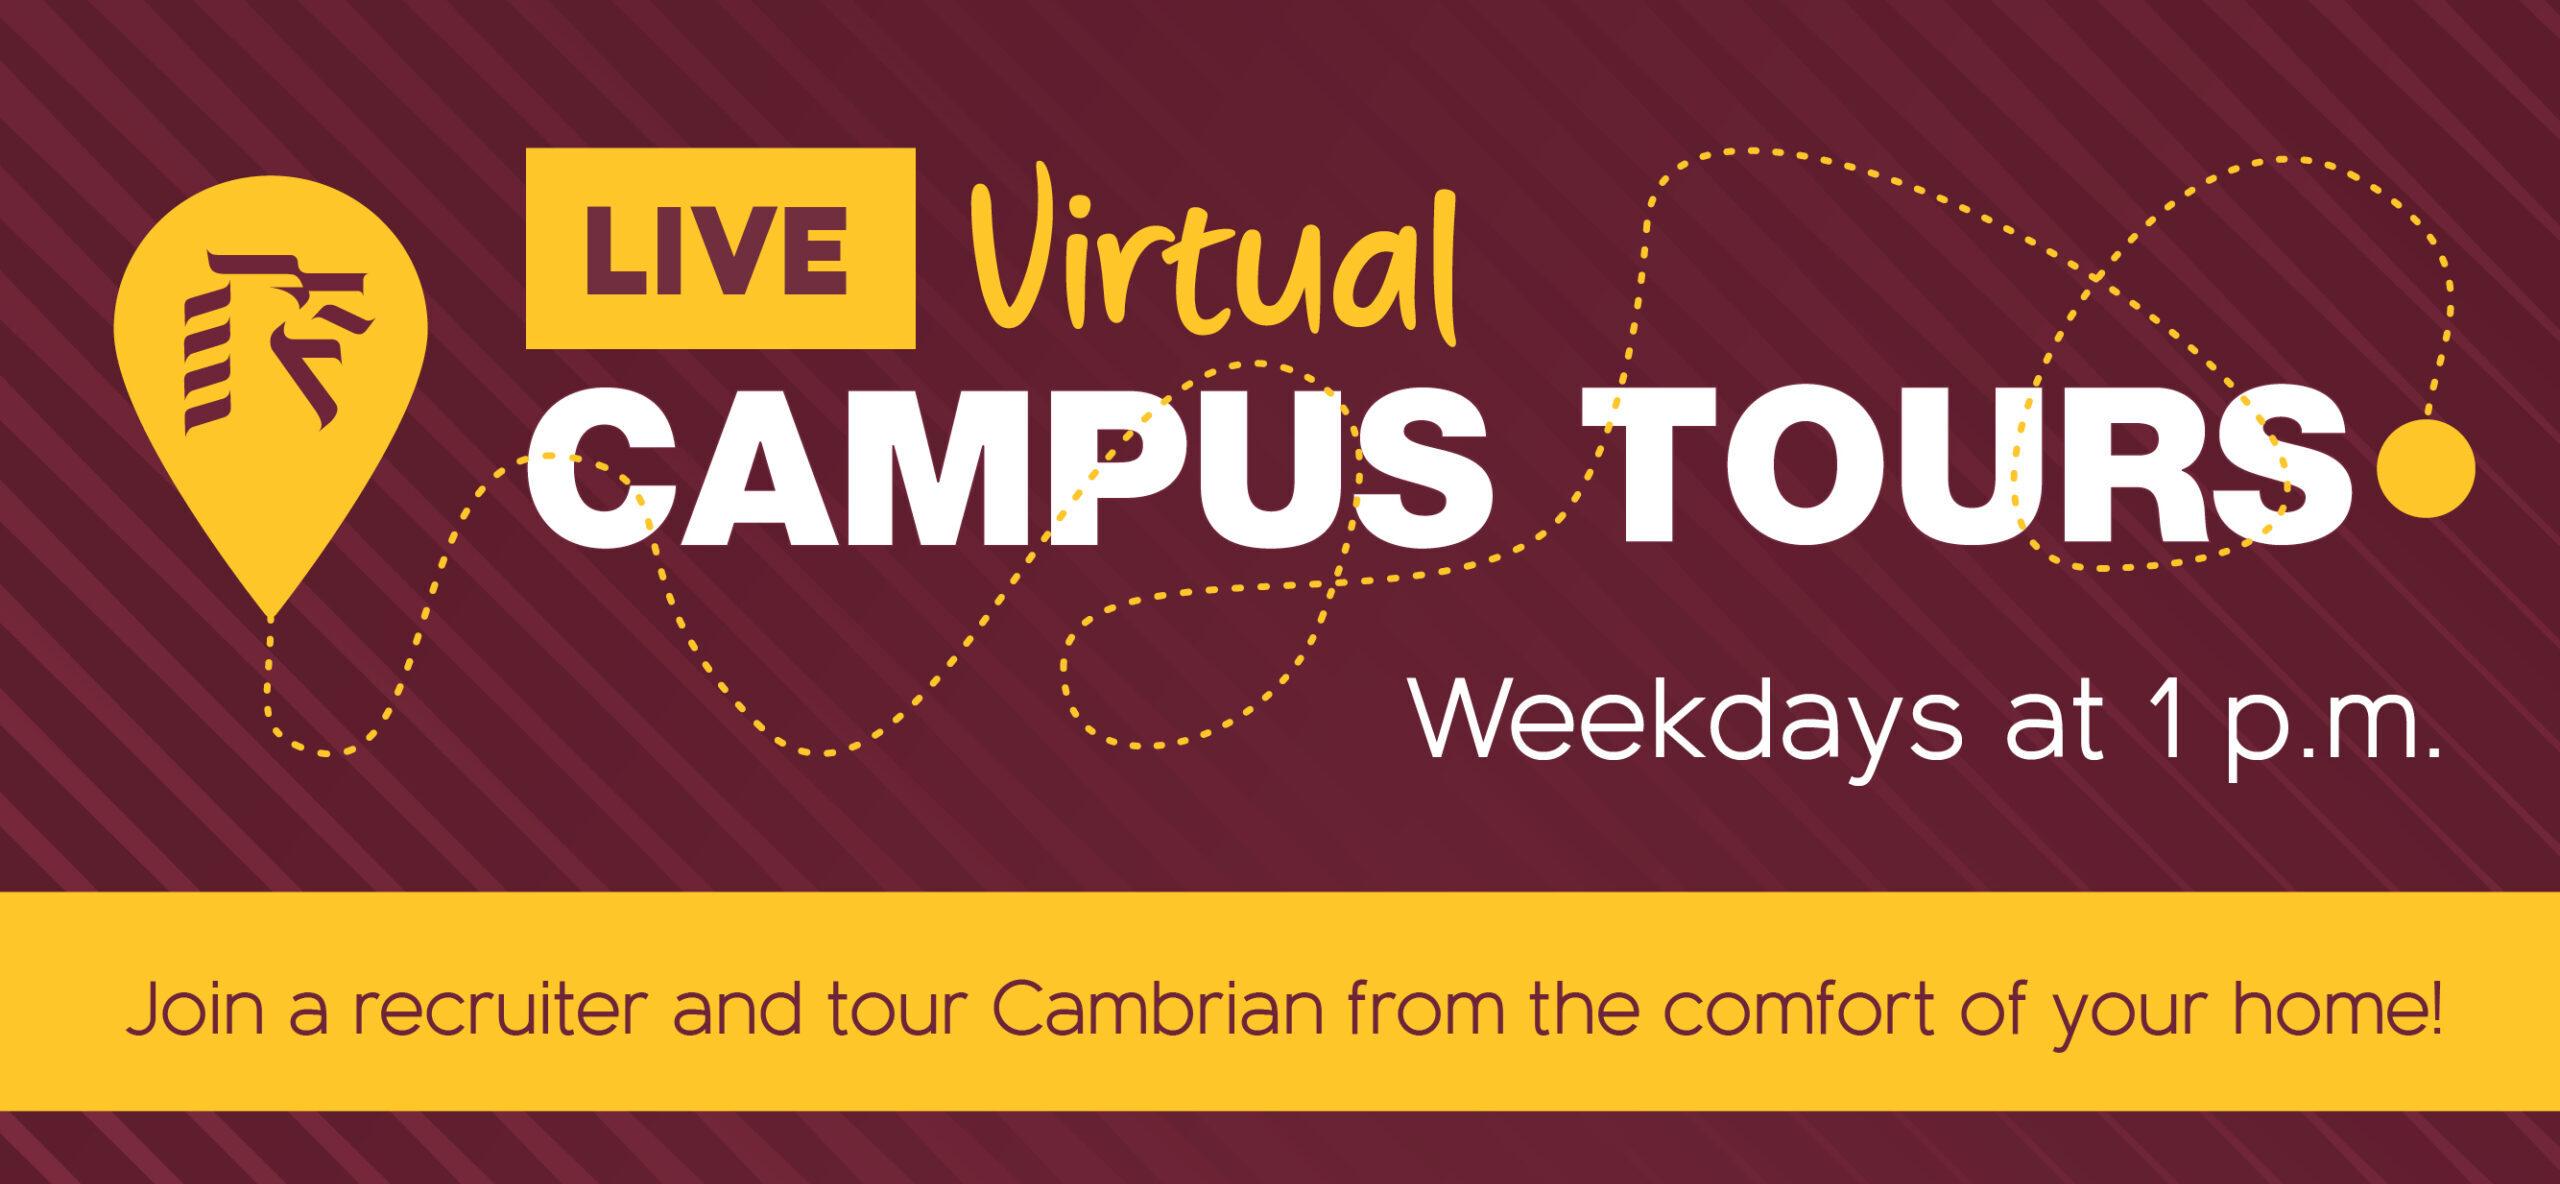 Book a Virtual Campus Tour at Cambrian College